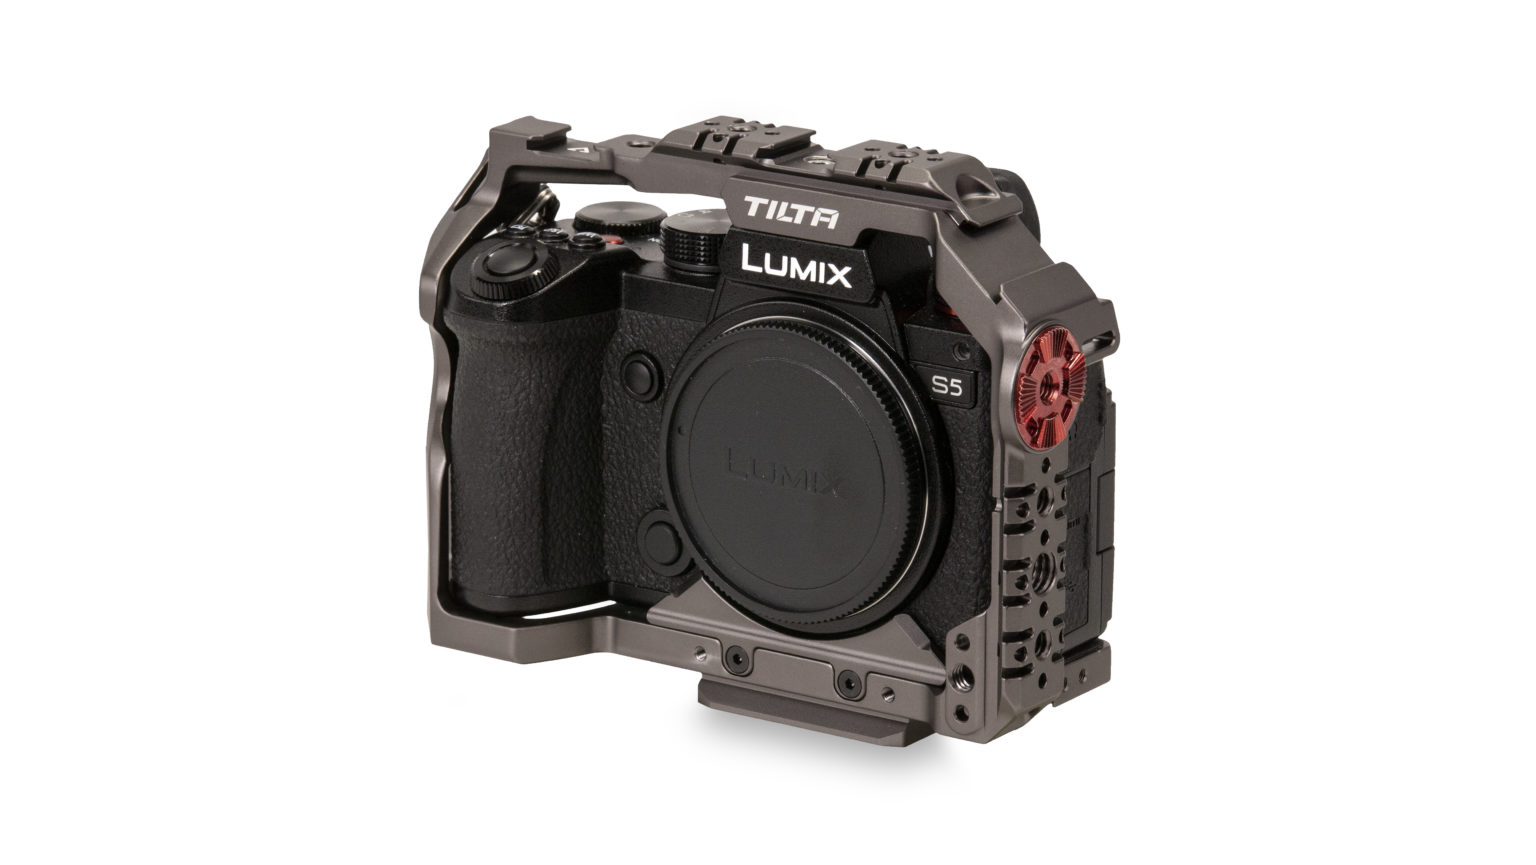 Full Camera Cage for Panasonic S5